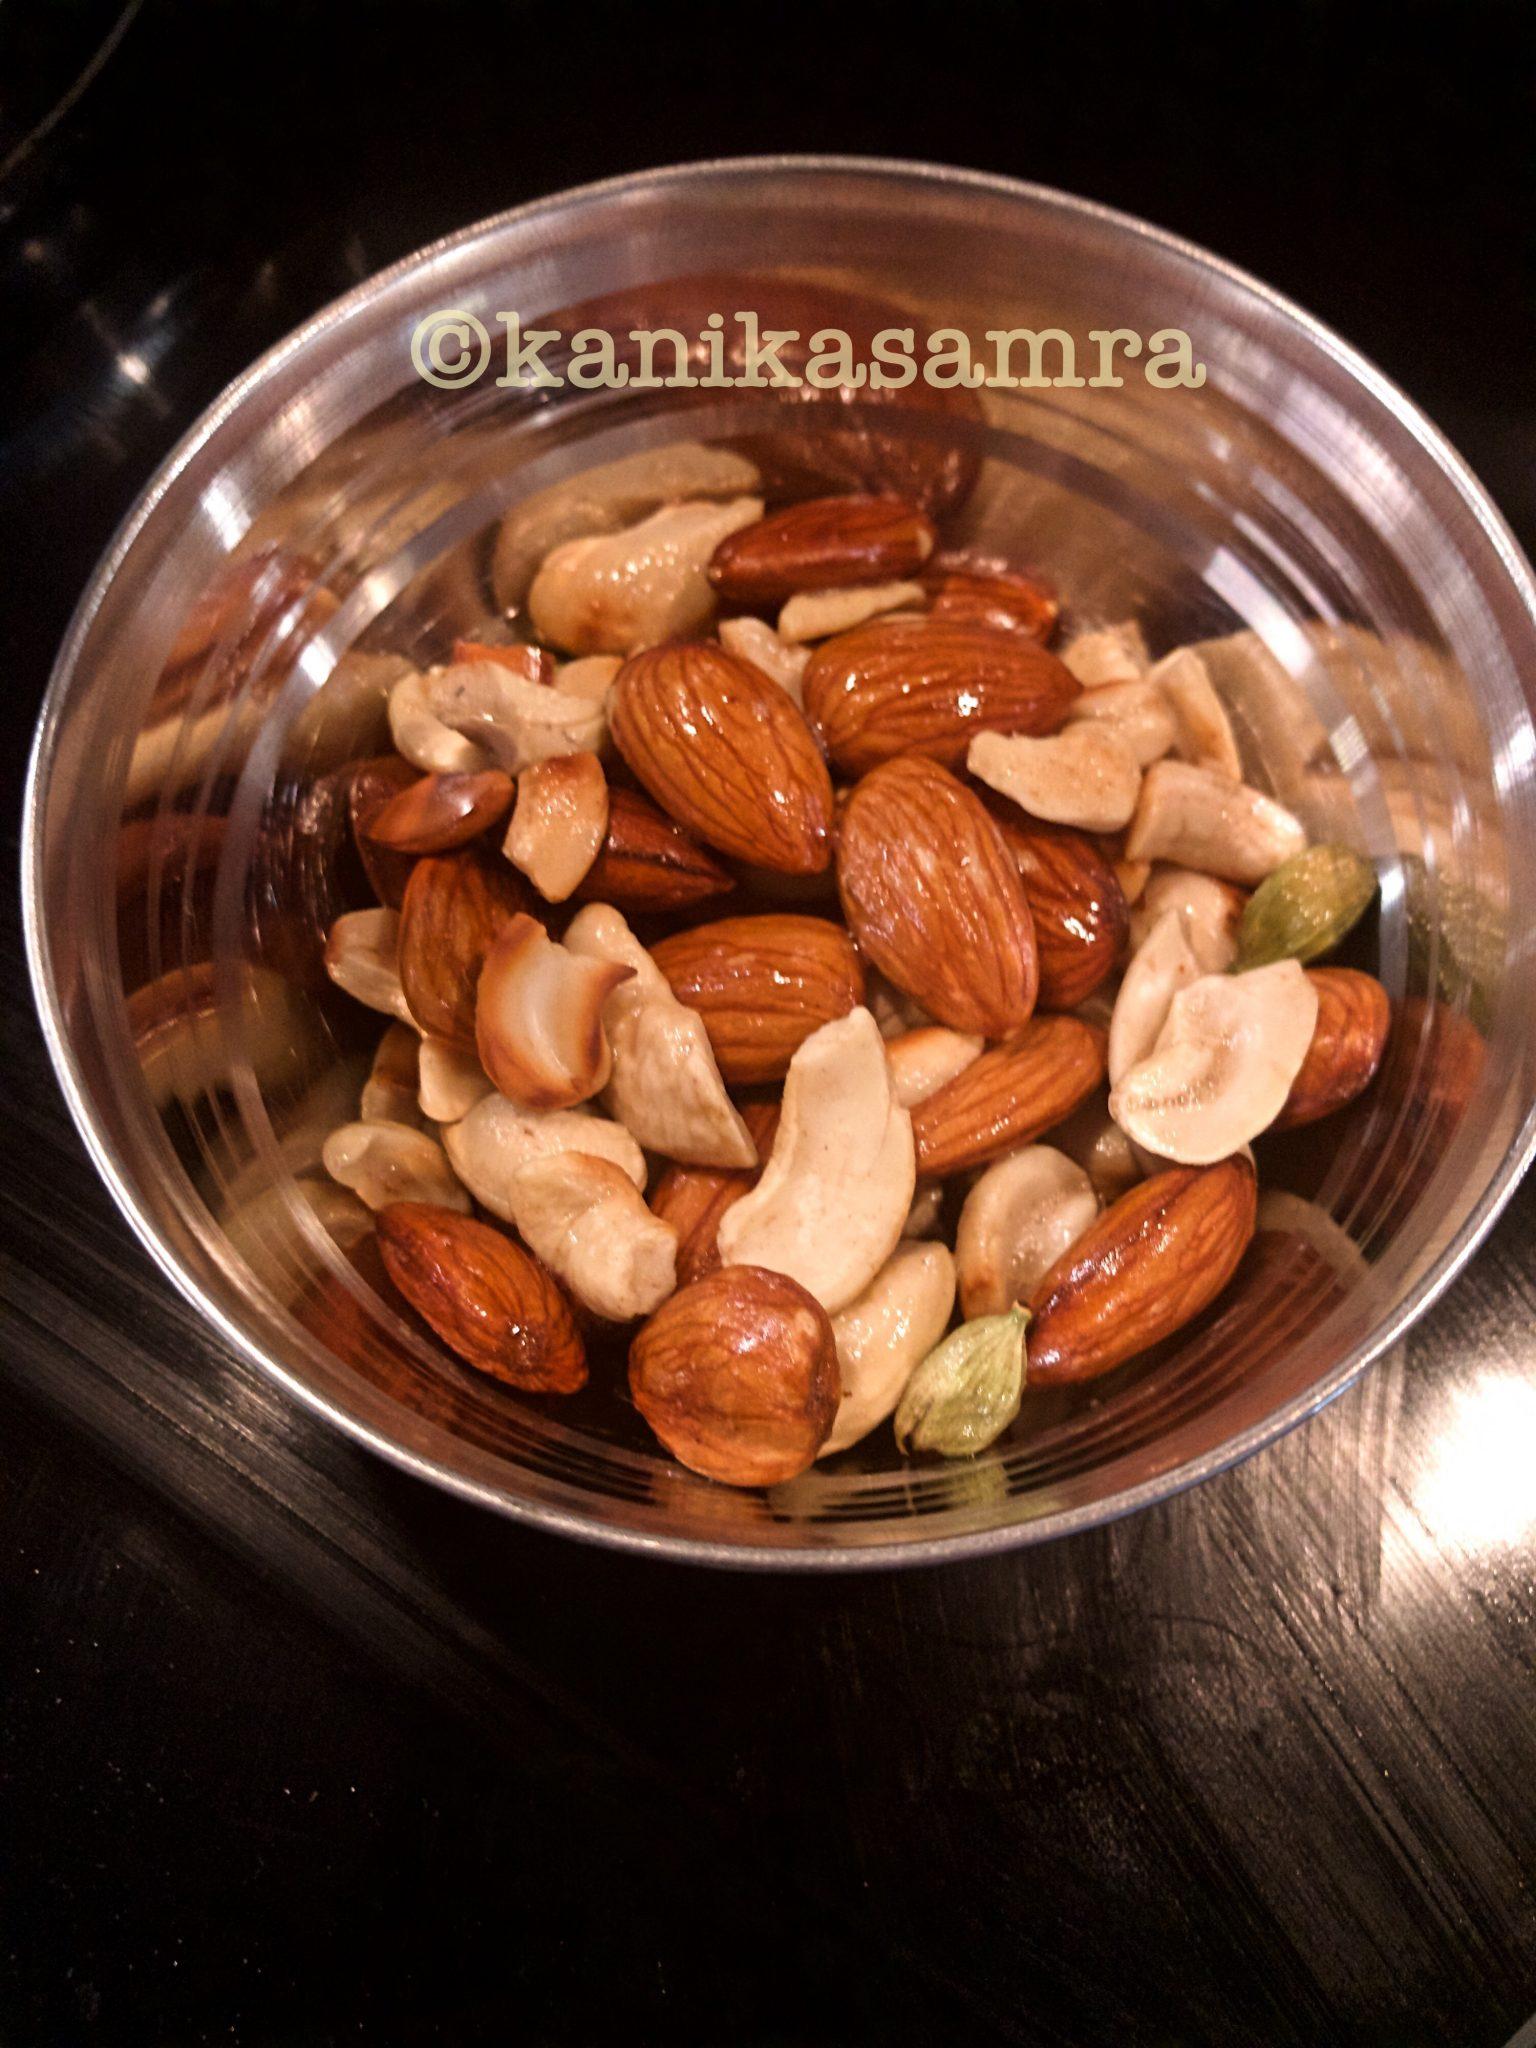 Sauteed nuts